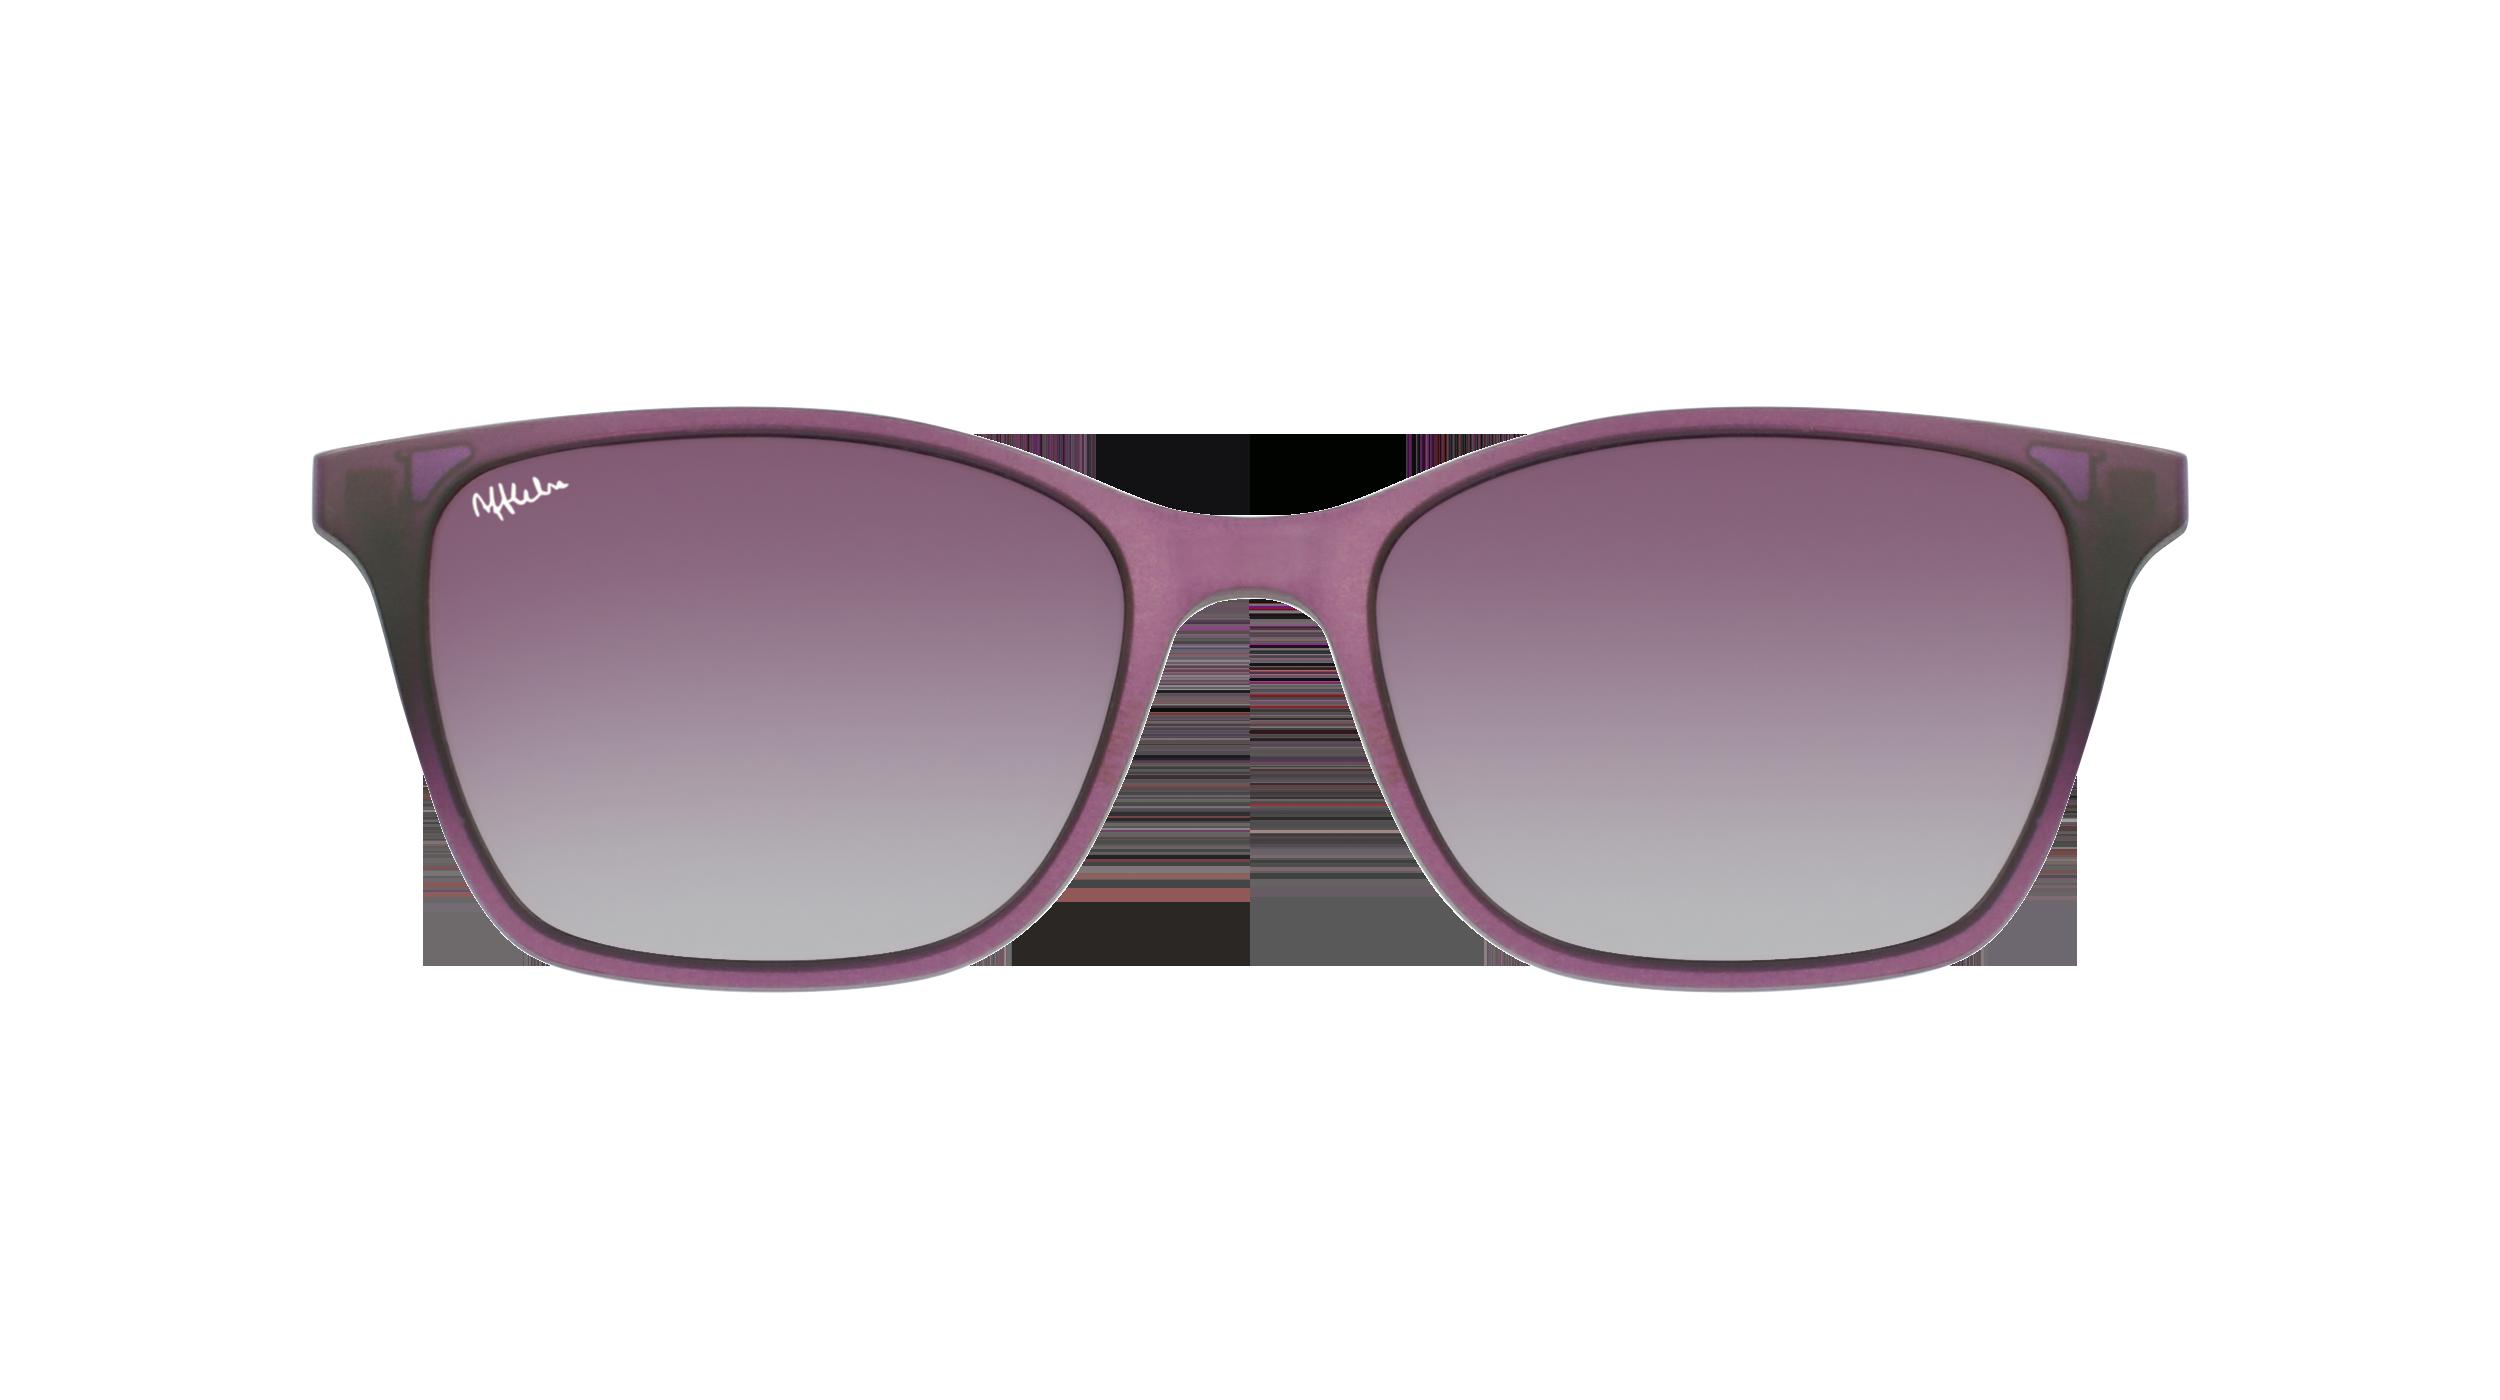 afflelou/france/products/smart_clip/clips_glasses/07630036457566.png